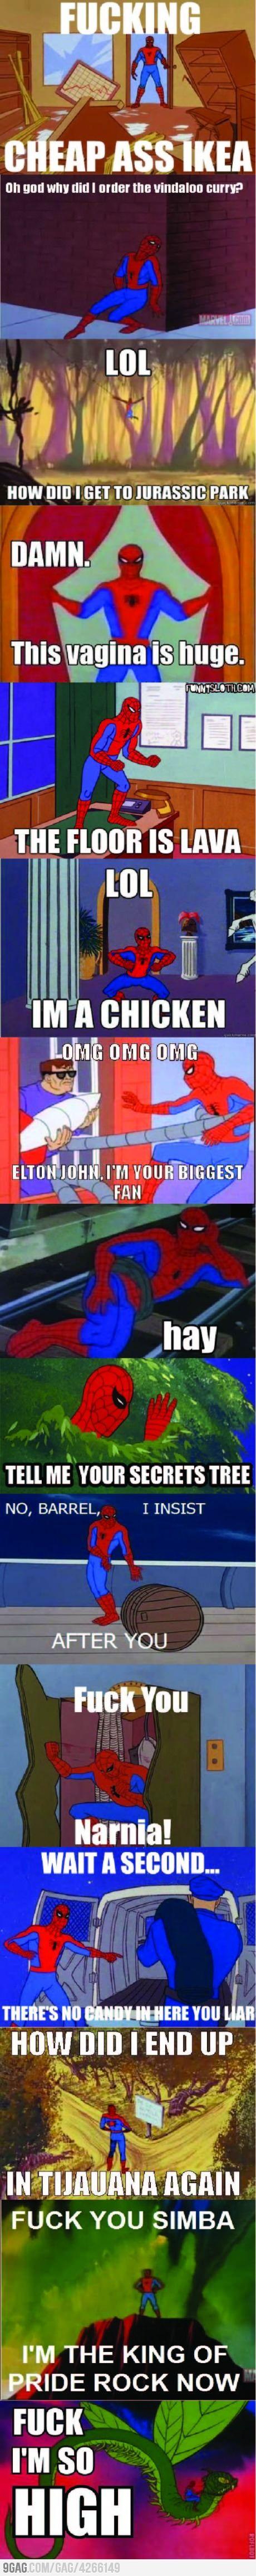 oh spidey haha